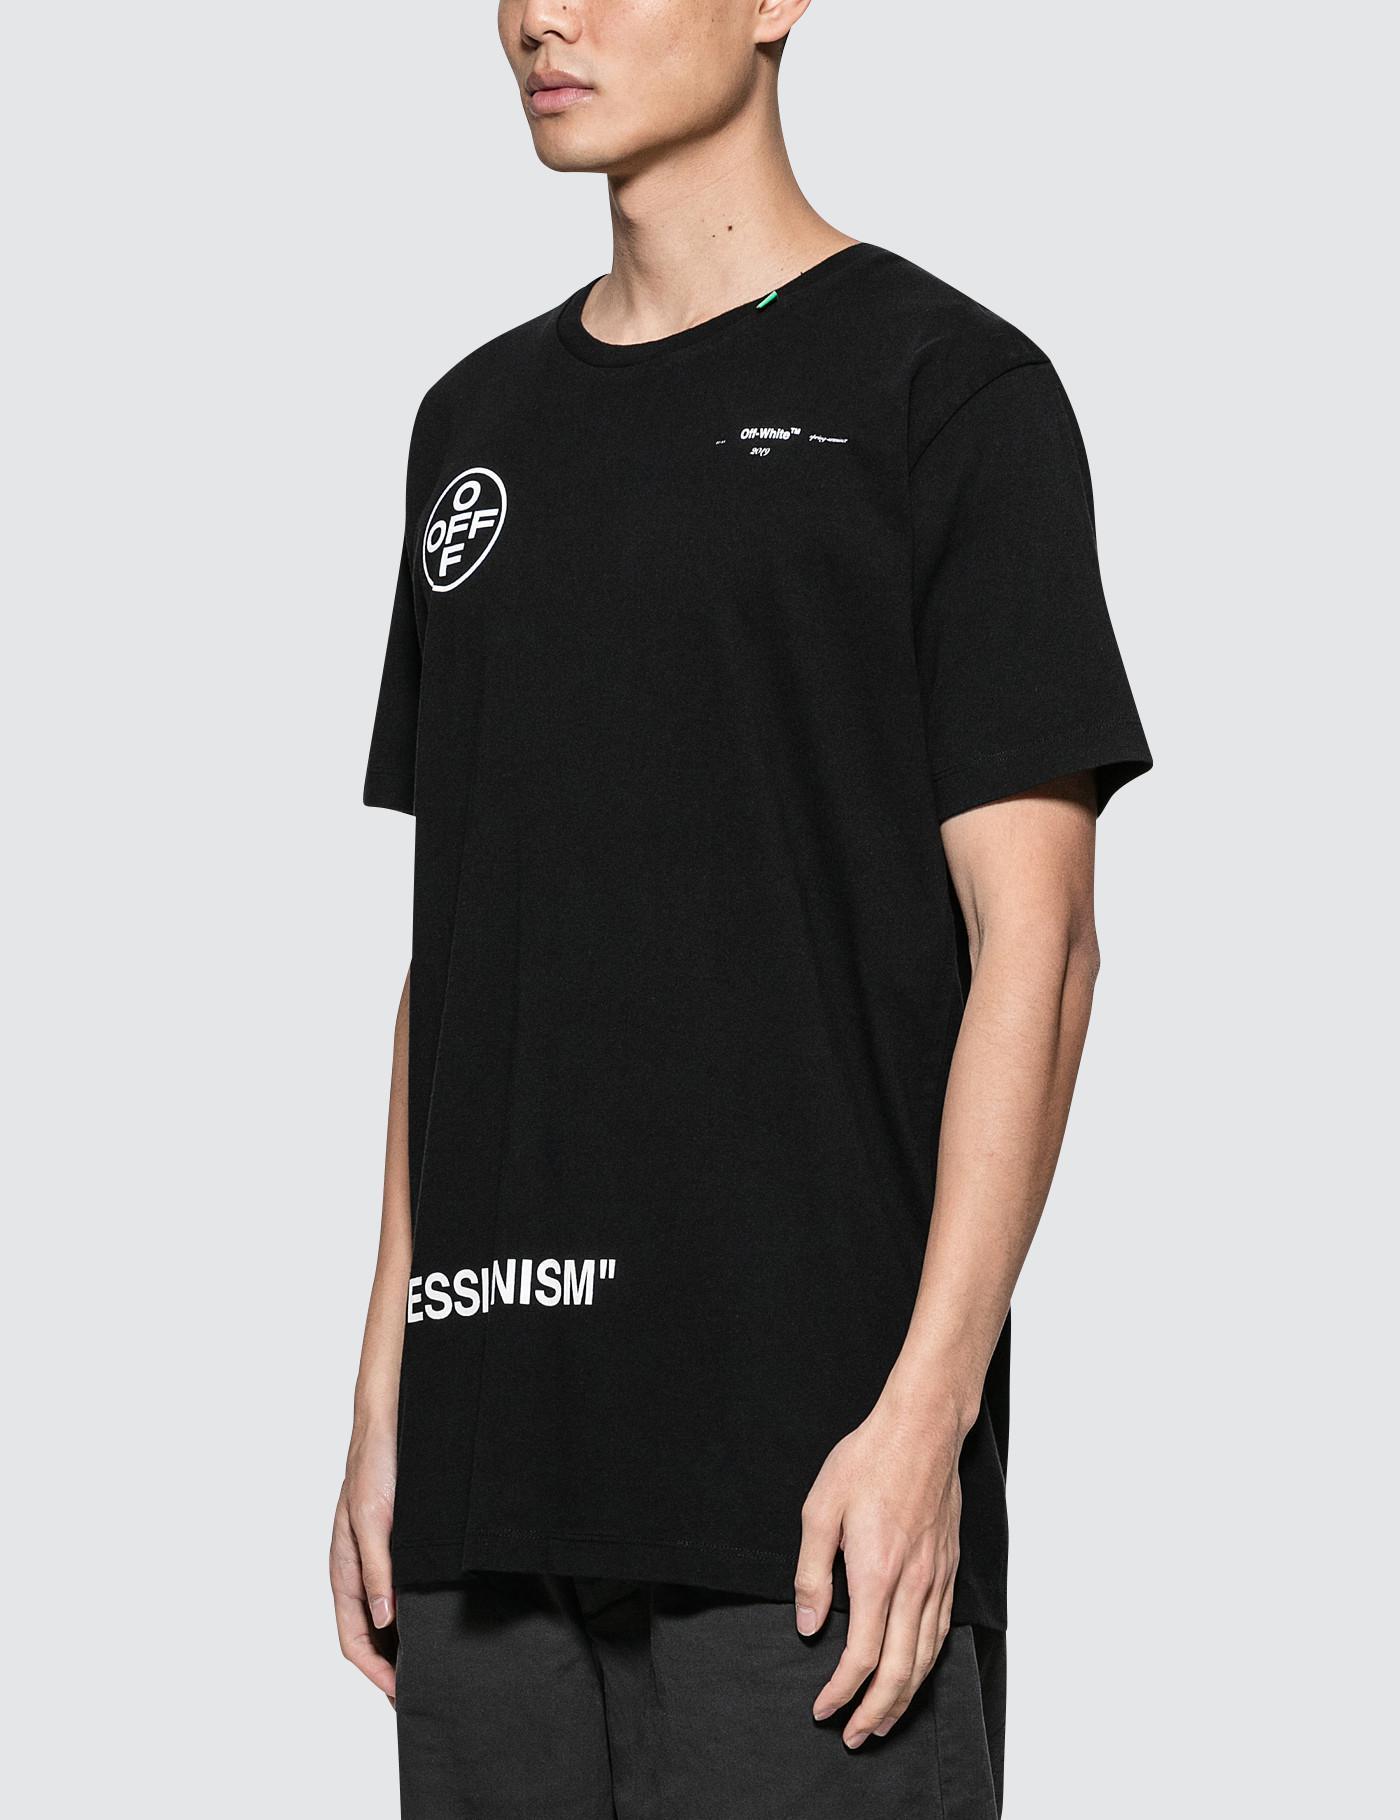 305ed0fa1b0f Off-White c o Virgil Abloh Stencil S s Slim T-shirt in Black for Men - Lyst